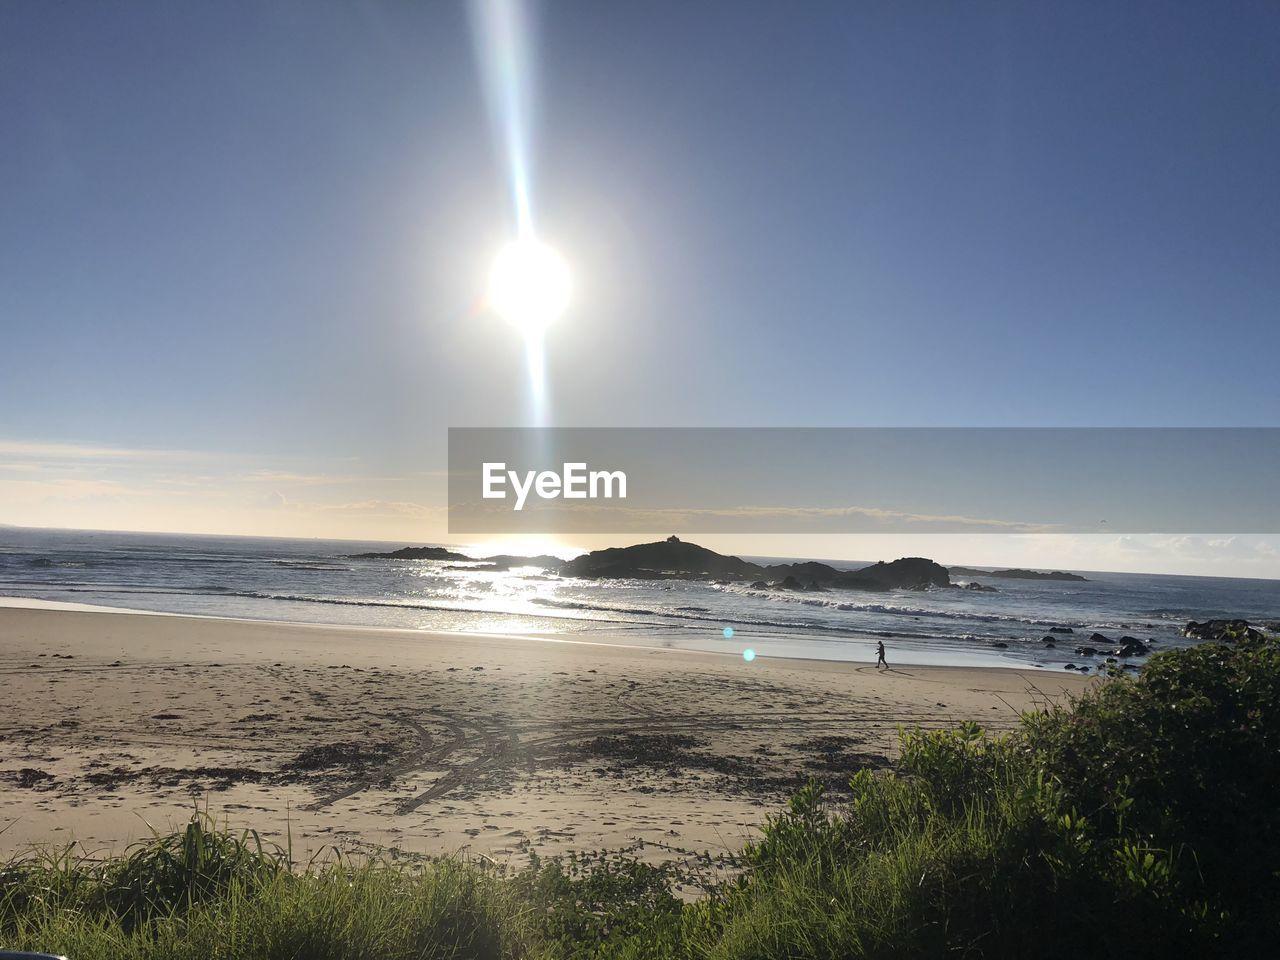 water, sky, sea, beach, beauty in nature, land, scenics - nature, tranquil scene, tranquility, nature, sun, horizon, horizon over water, sunlight, no people, non-urban scene, idyllic, sunbeam, sand, outdoors, lens flare